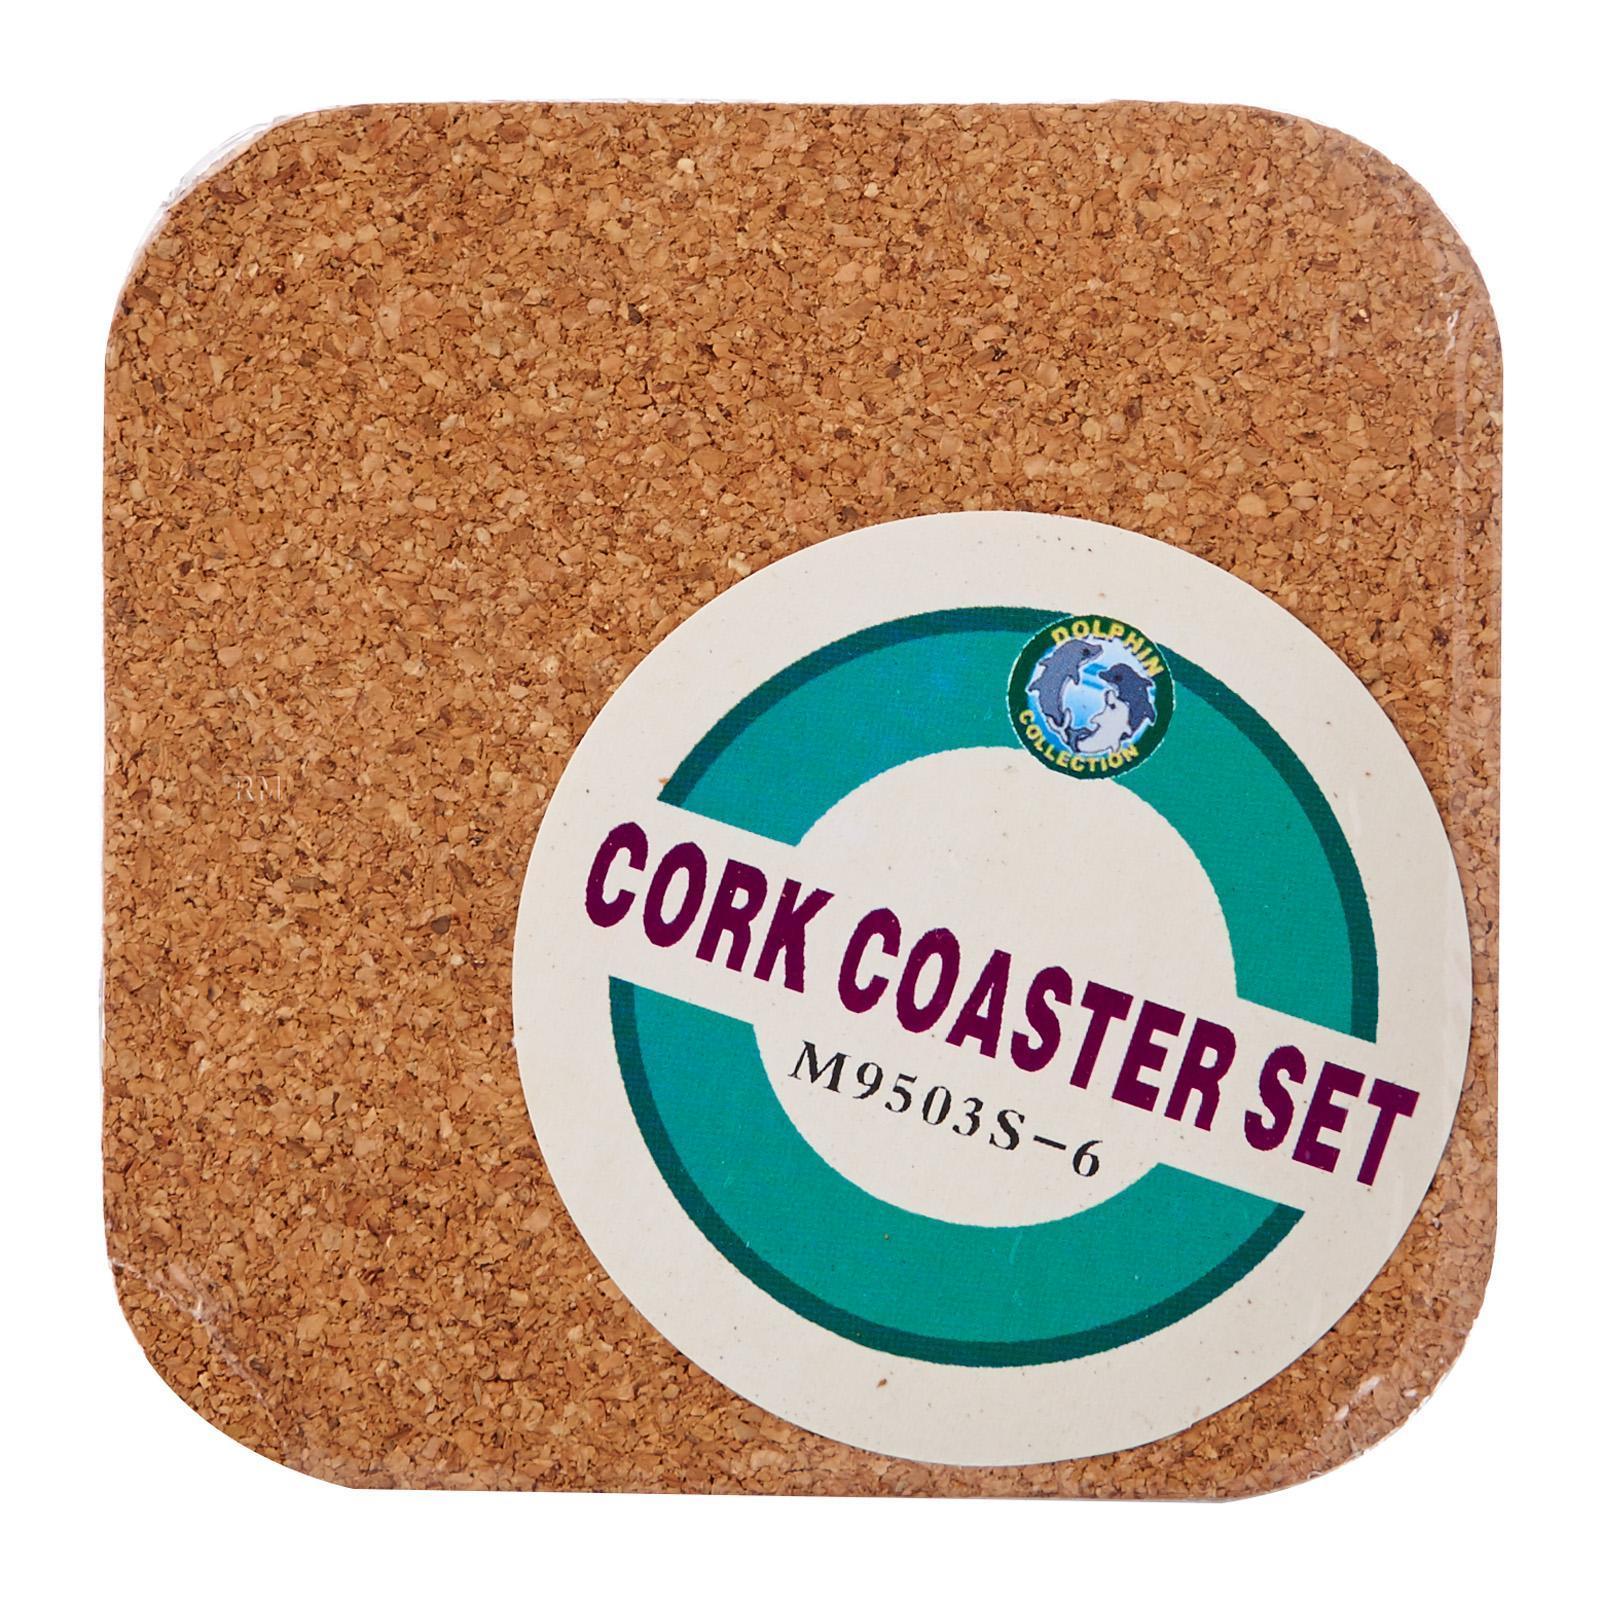 Dolphin Collection Square Cork Coaster 6 PCS Set